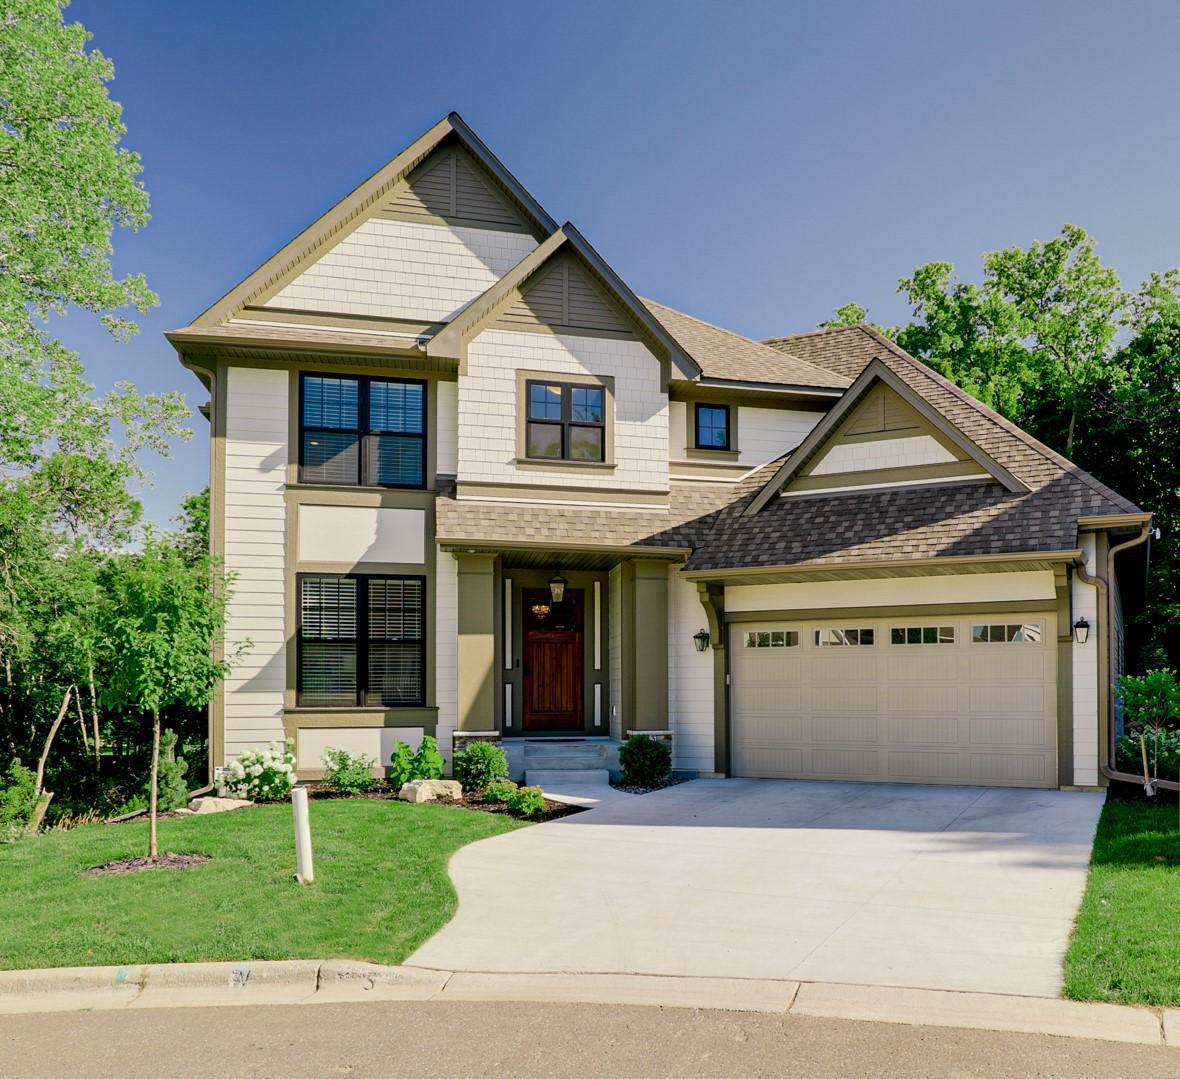 3427 Groveland Lane Property Photo - Minnetonka, MN real estate listing